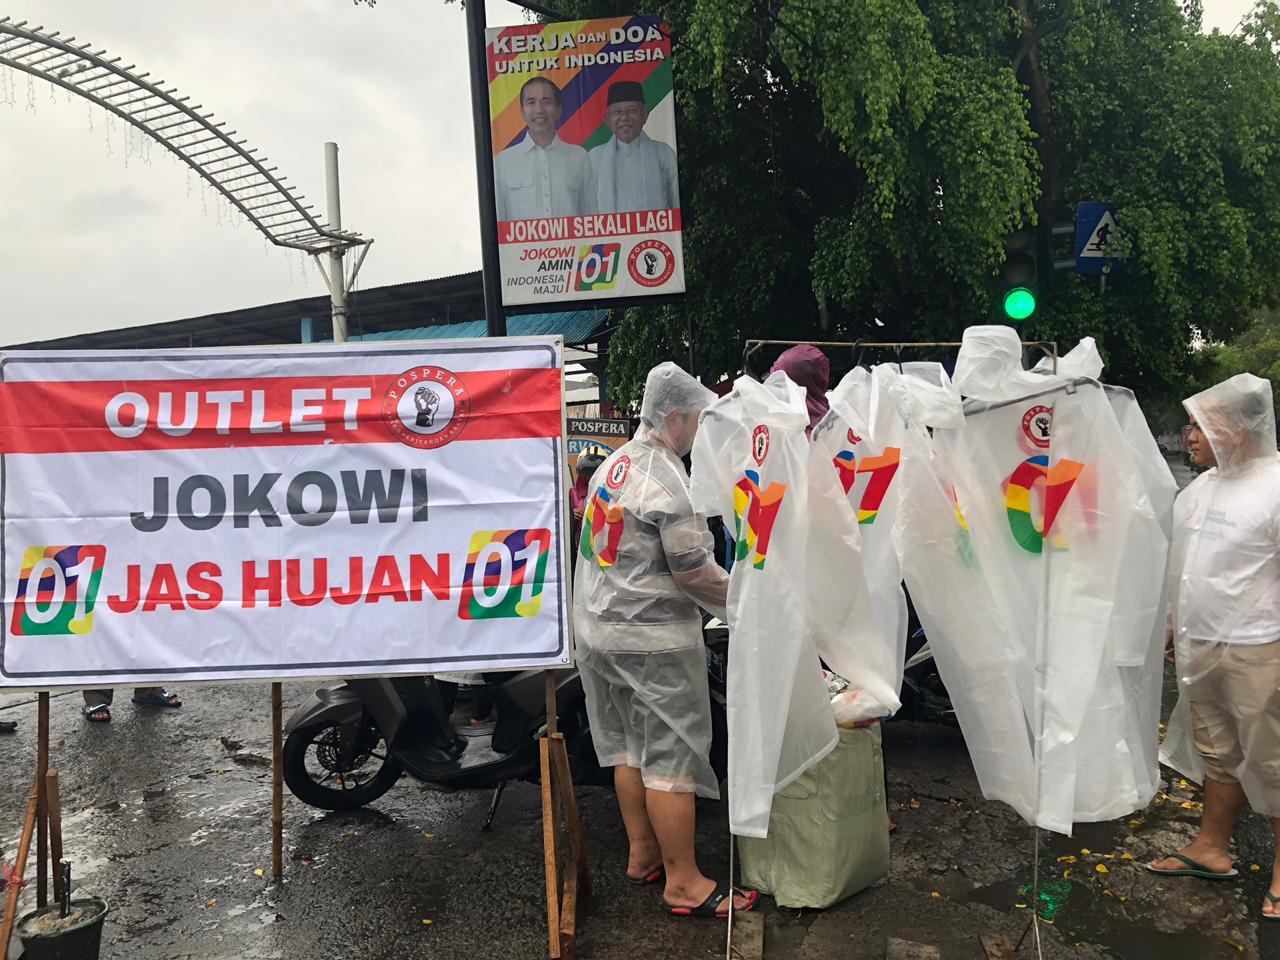 Begini Cara Relawan Pospera Sosialiasi Jokowi Dengan Jas Hujan